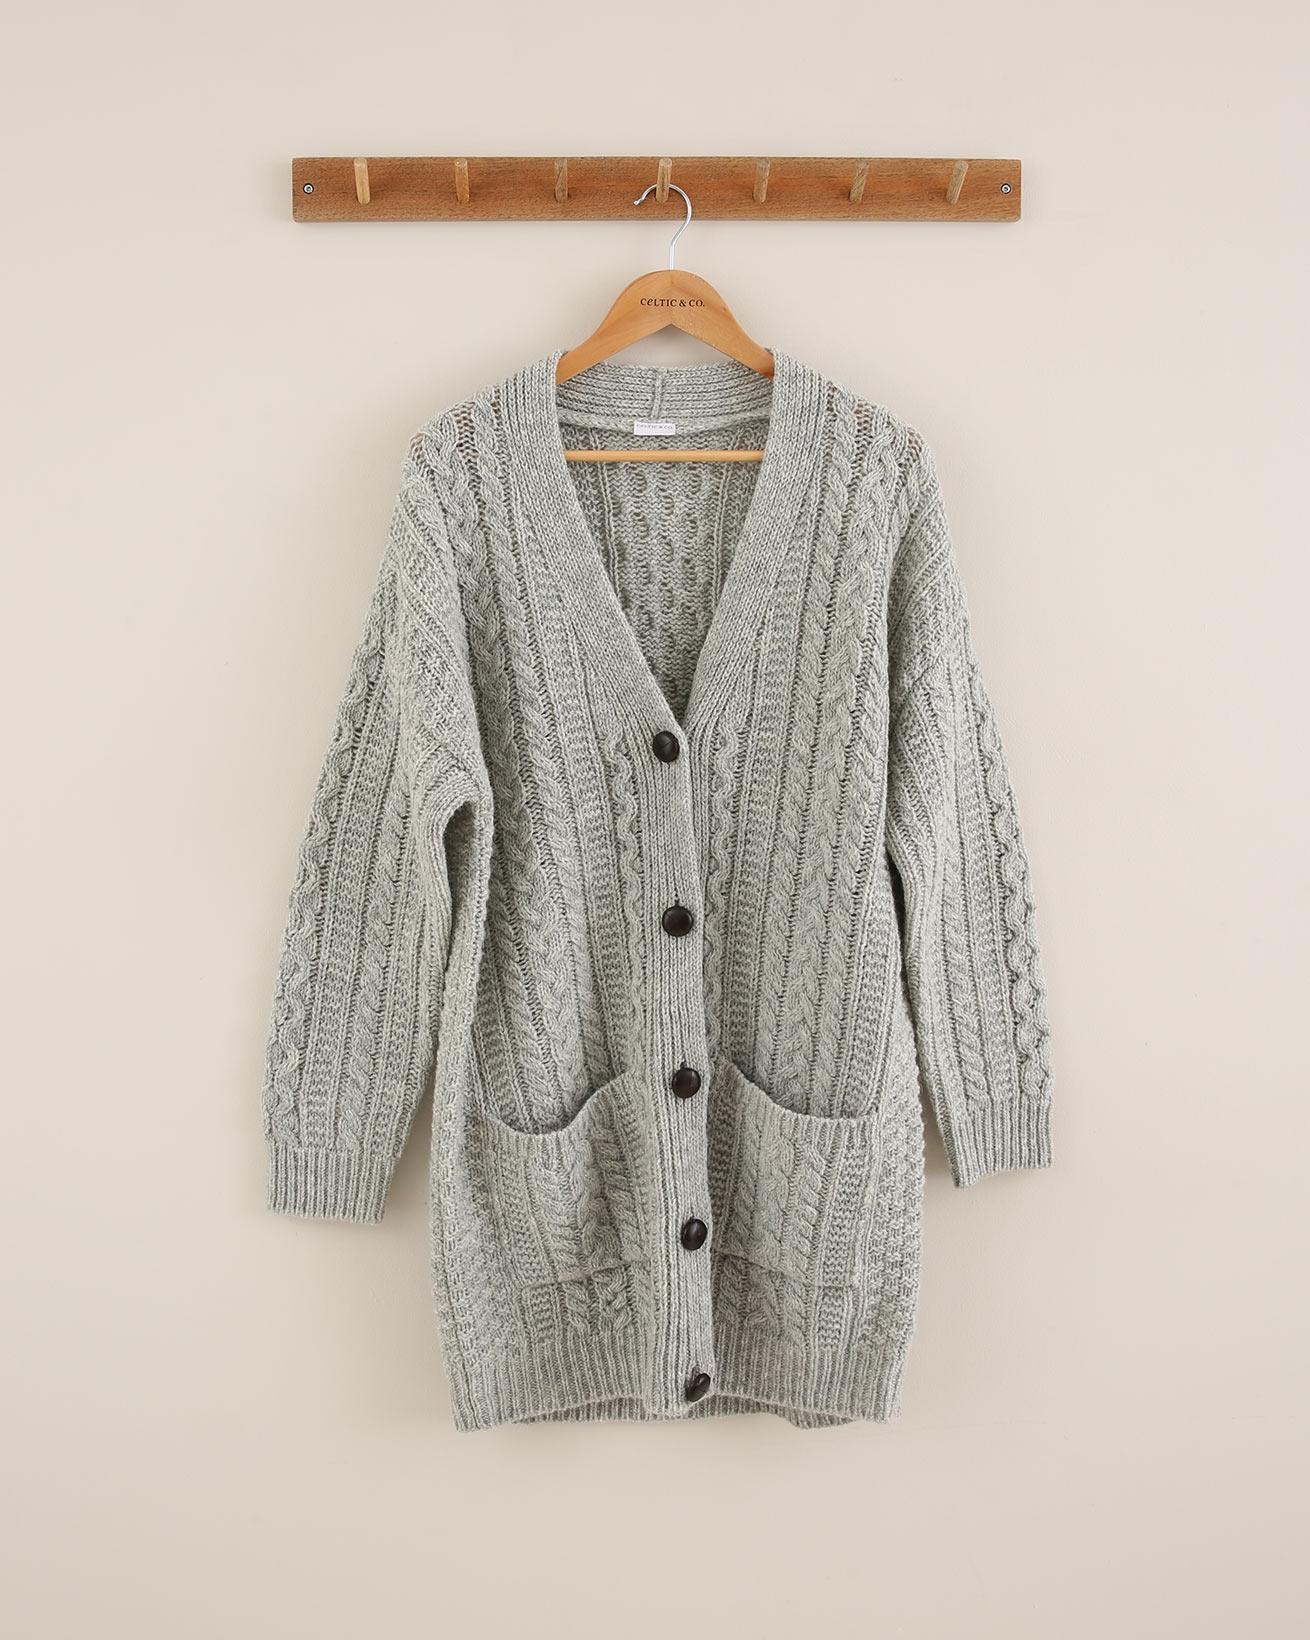 Cable Boyfriend Cardigan - Size Small - Silver Grey - 1766